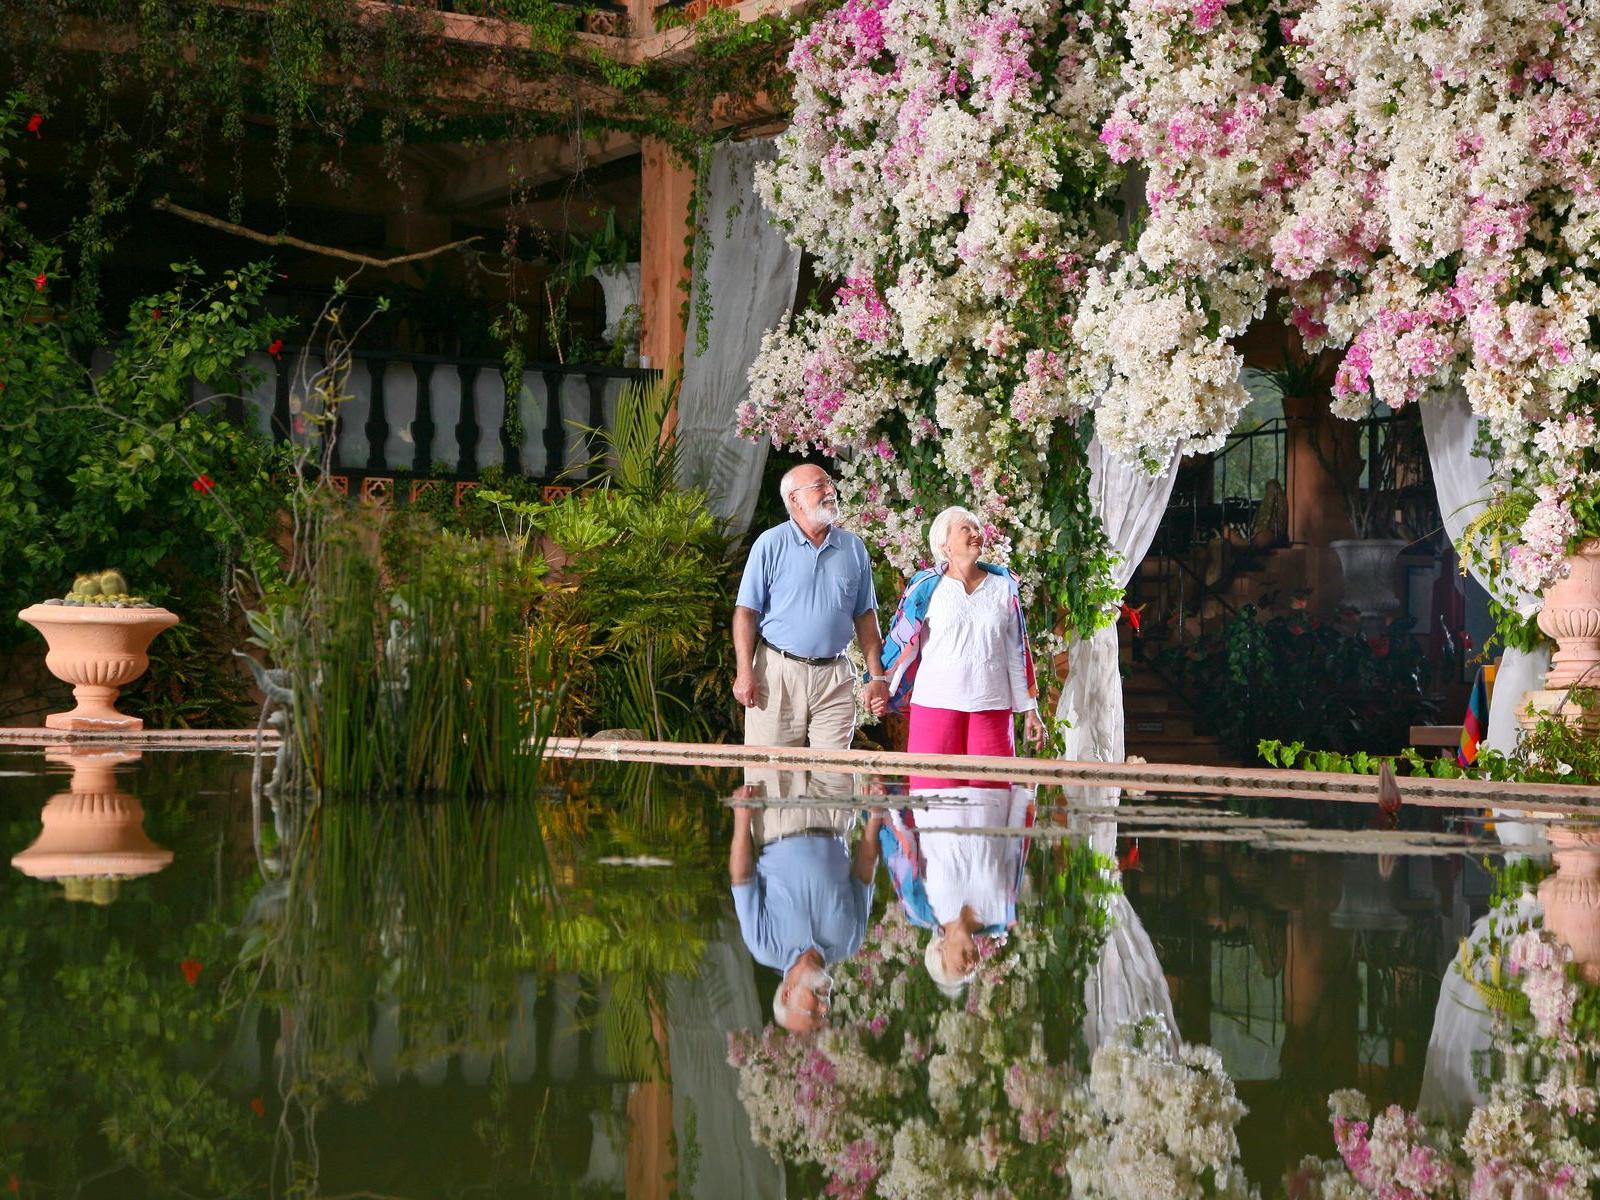 an elderly couple admiring flowers